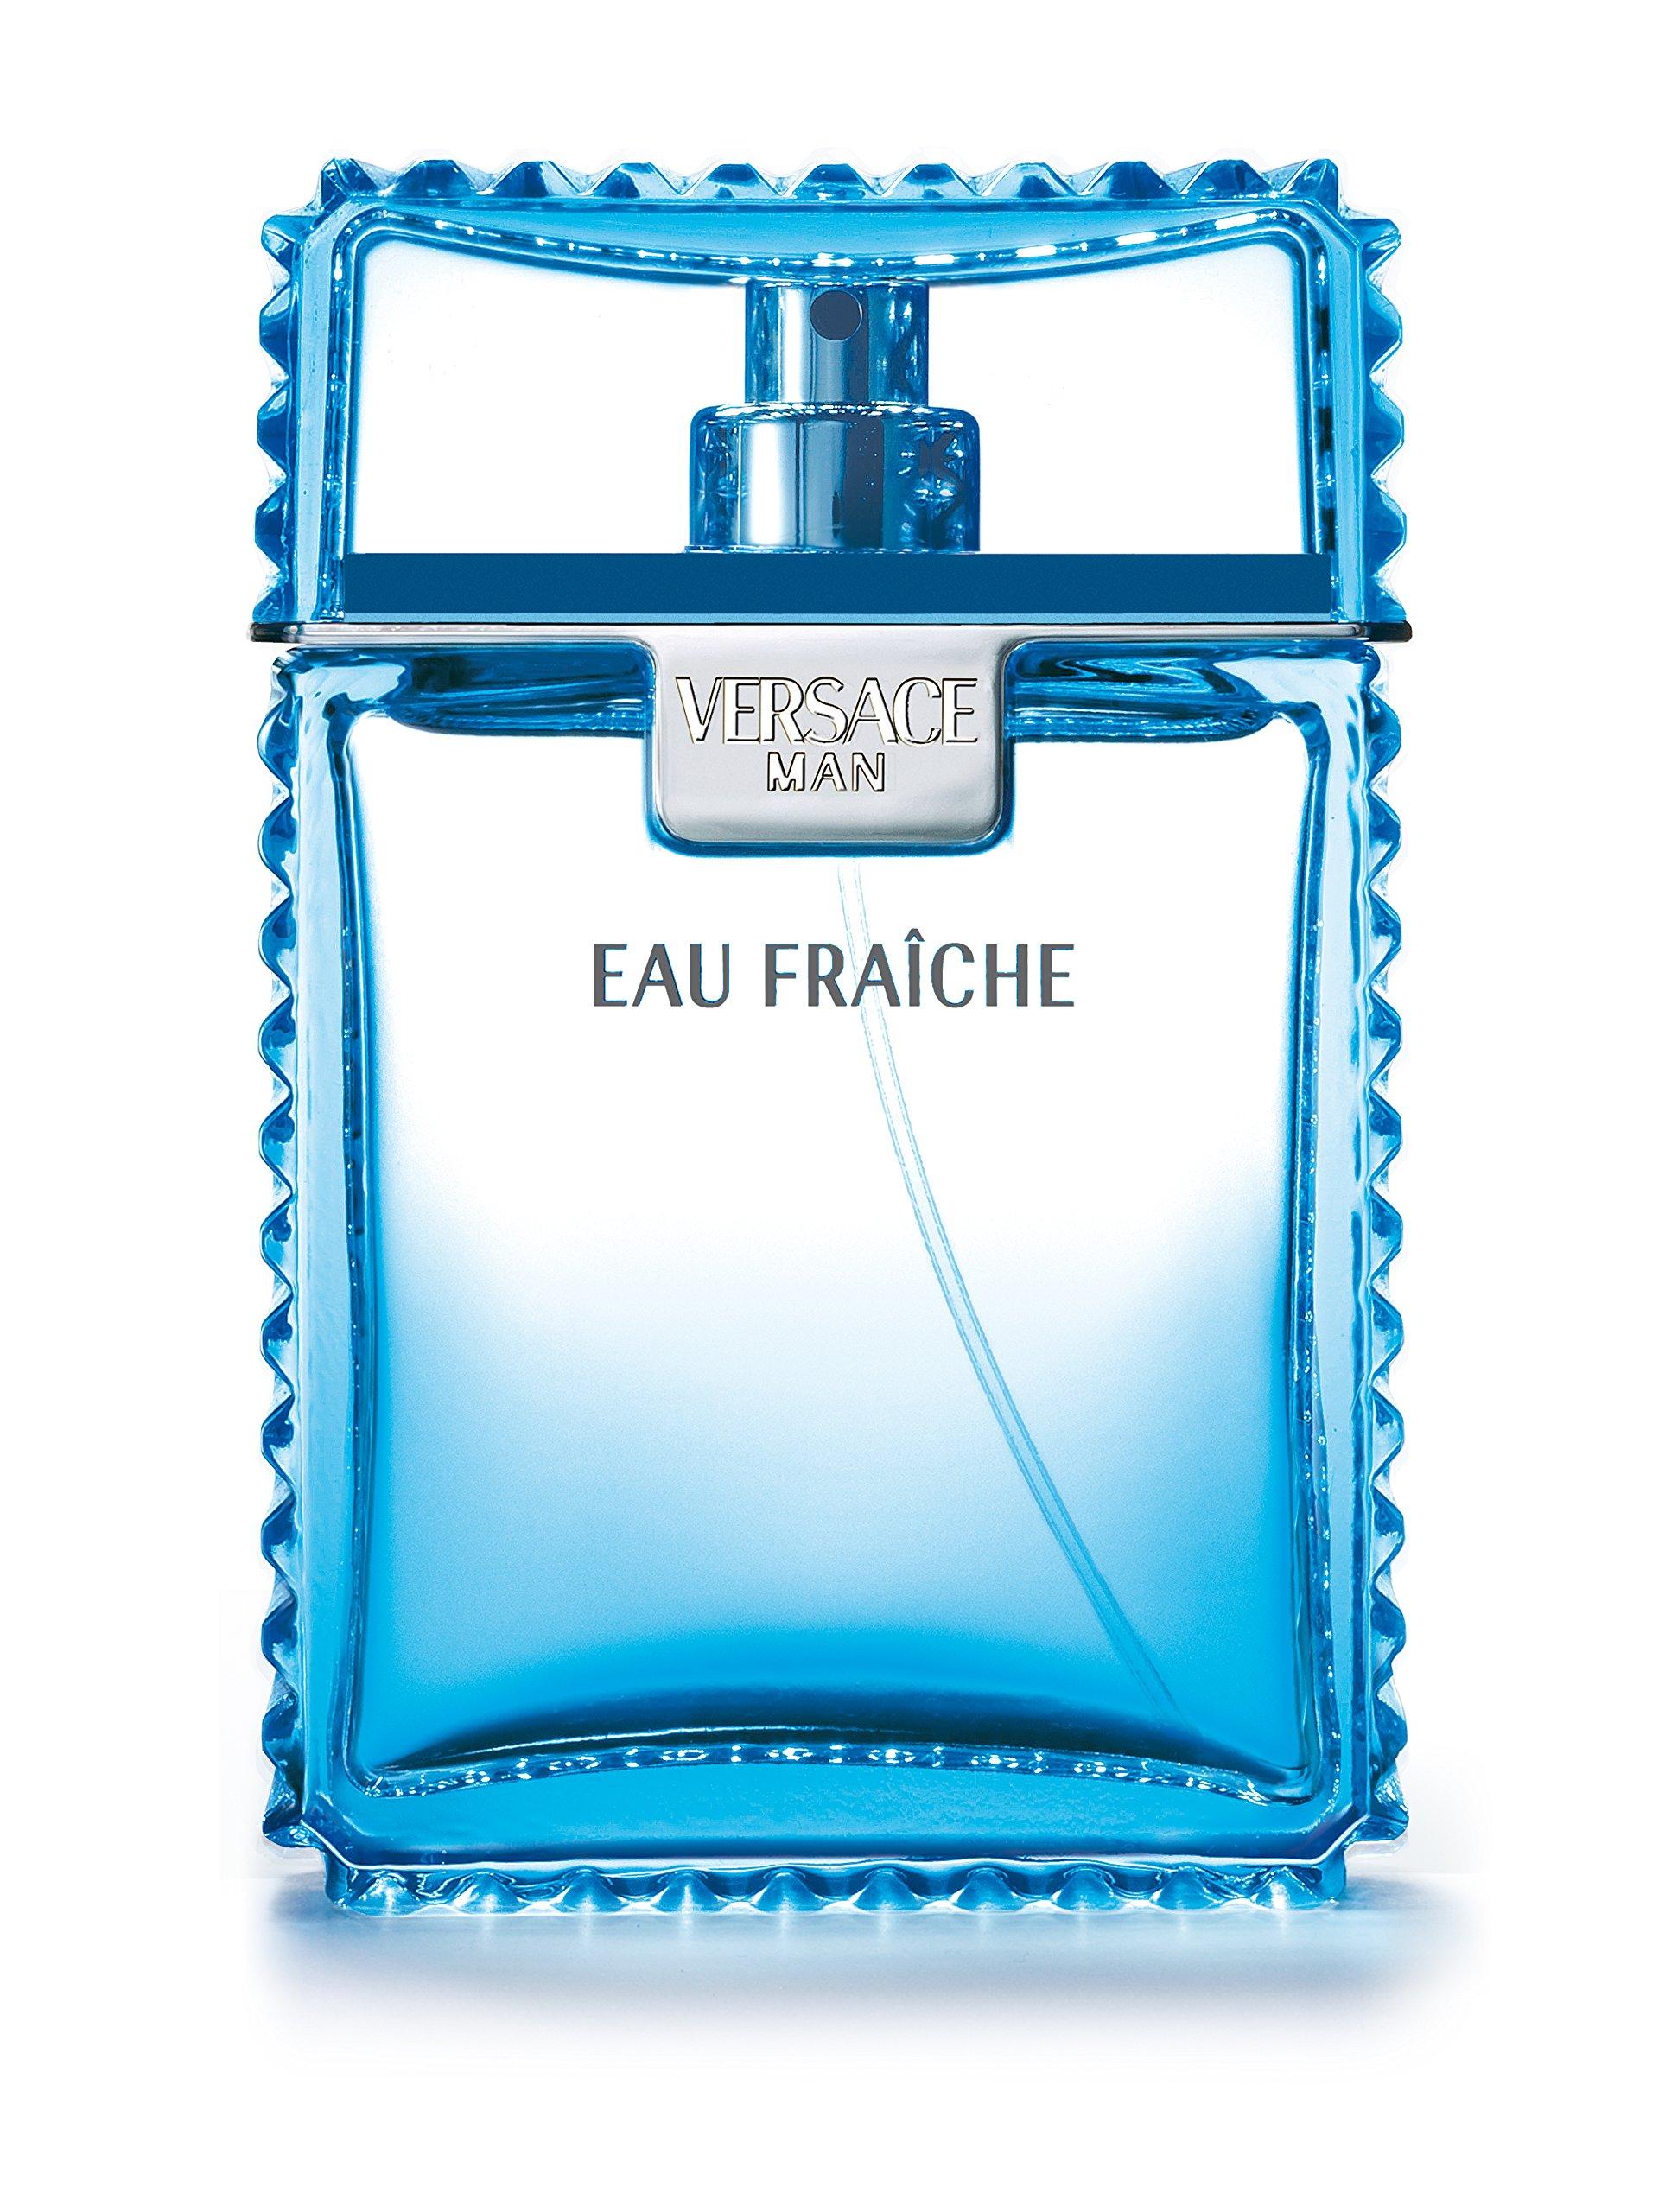 Versace Man Eau Fraiche By Gianni Versace For Men Deodorant Spray 3.4 Oz by Versace